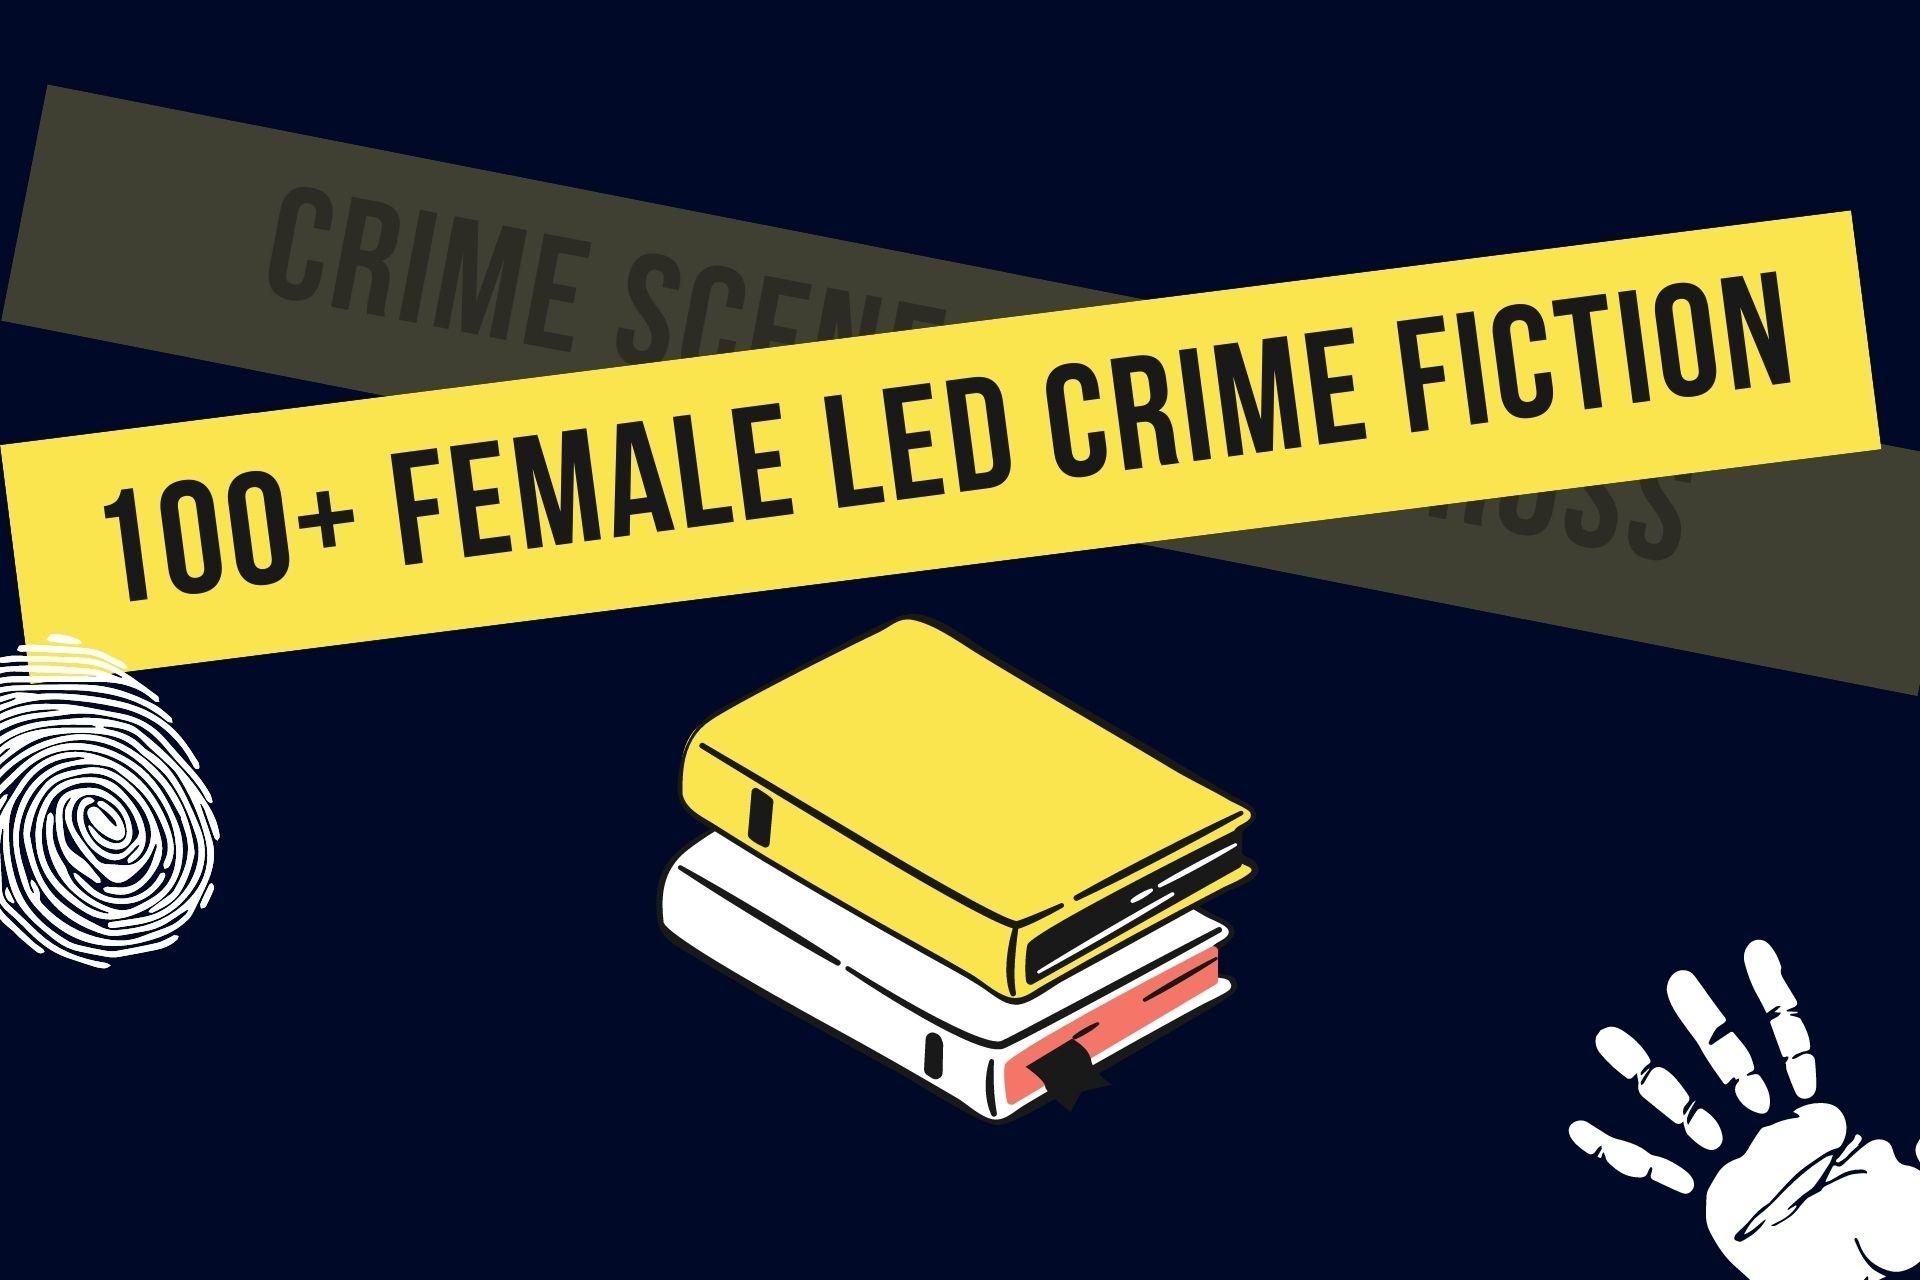 100+ Female Led Crime Fiction